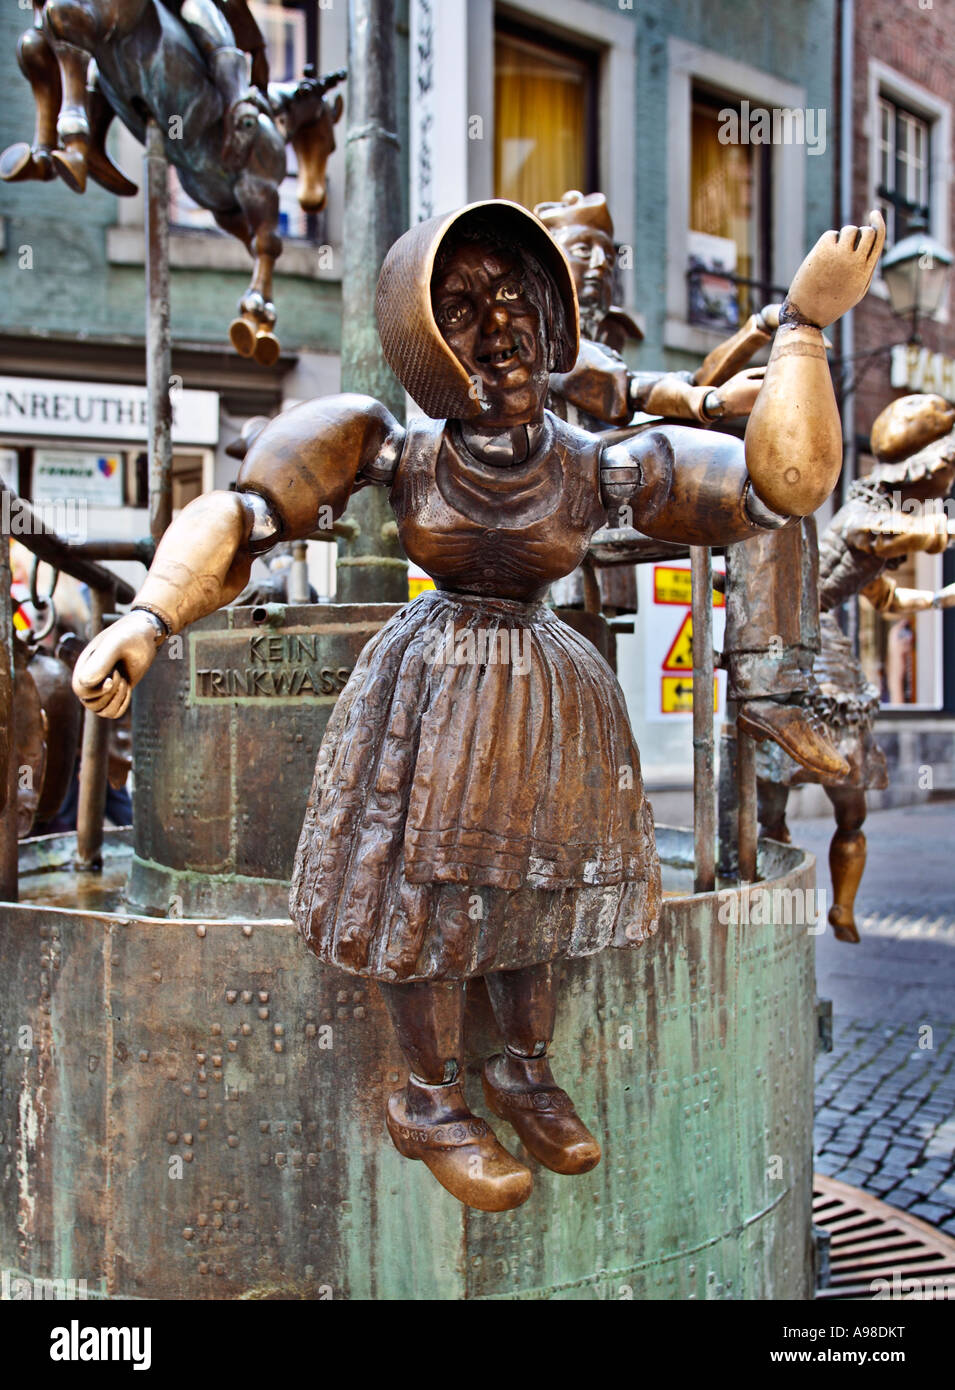 Aachen, Germany - Puppenbrunnen fountain statue - public art - Stock Image